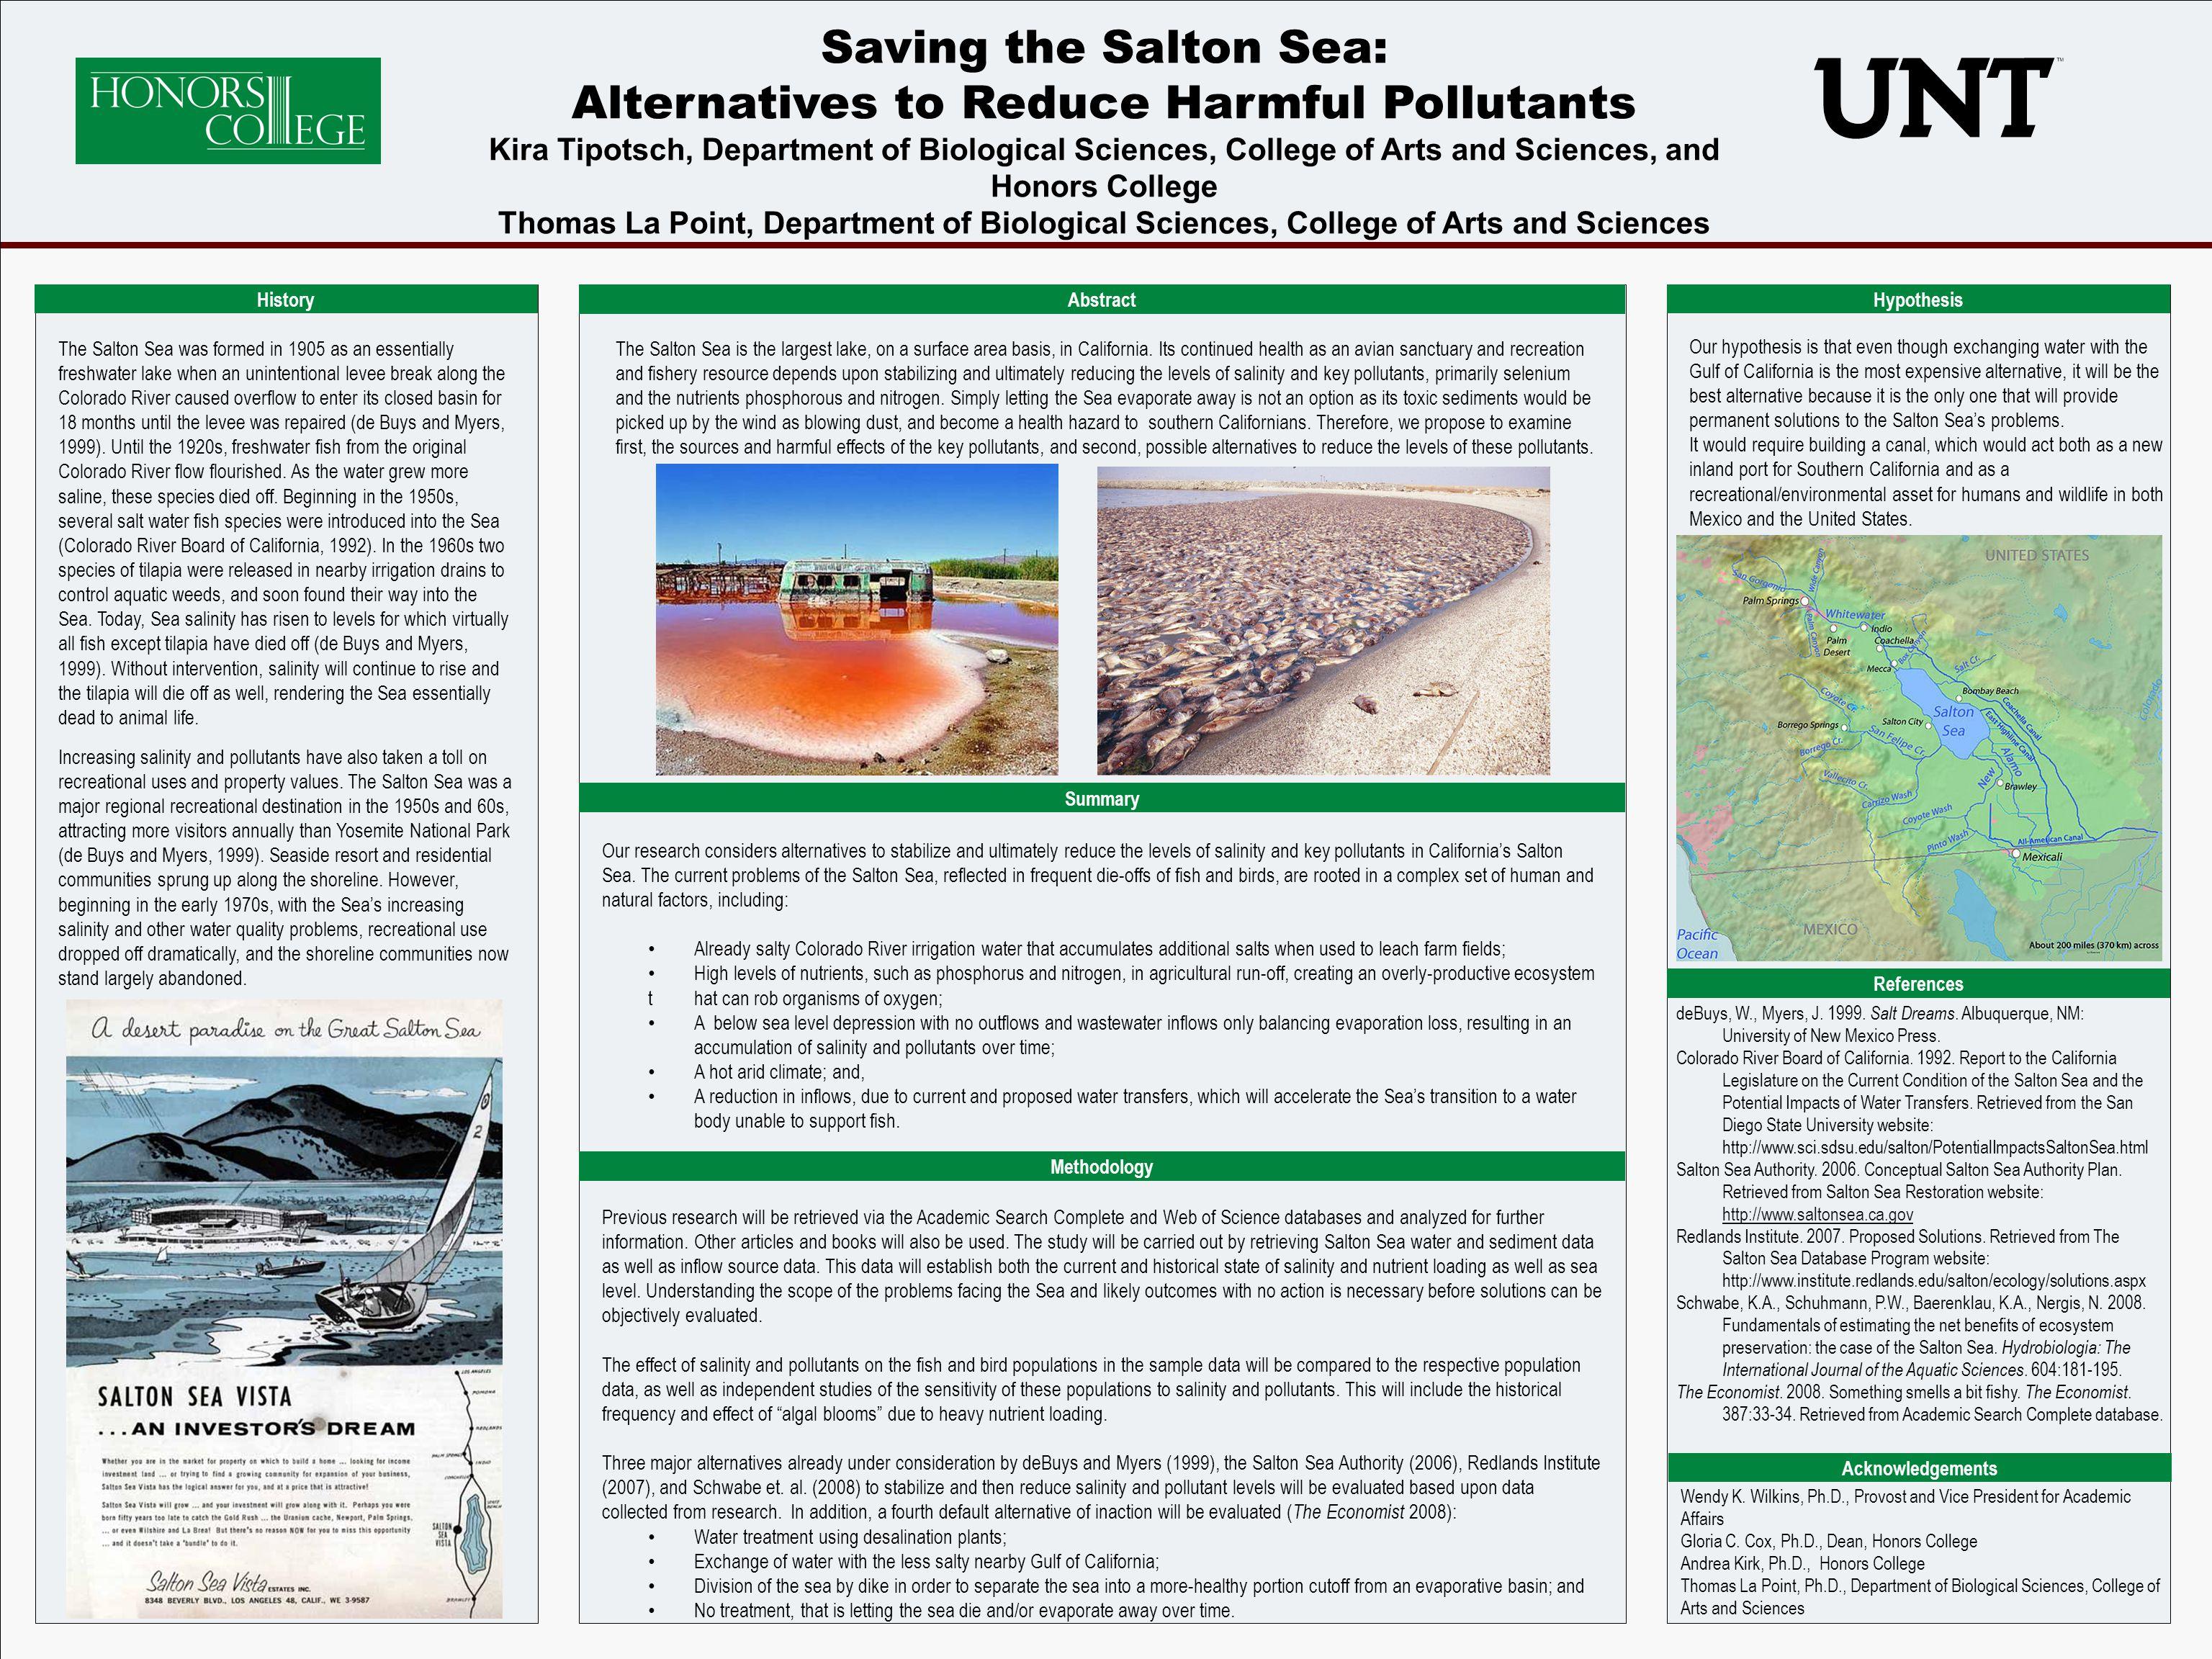 POSTER TEMPLATE BY: www.PosterPresentations.com Saving the Salton Sea: Alternatives to Reduce Harmful Pollutants Kira Tipotsch, Department of Biologic